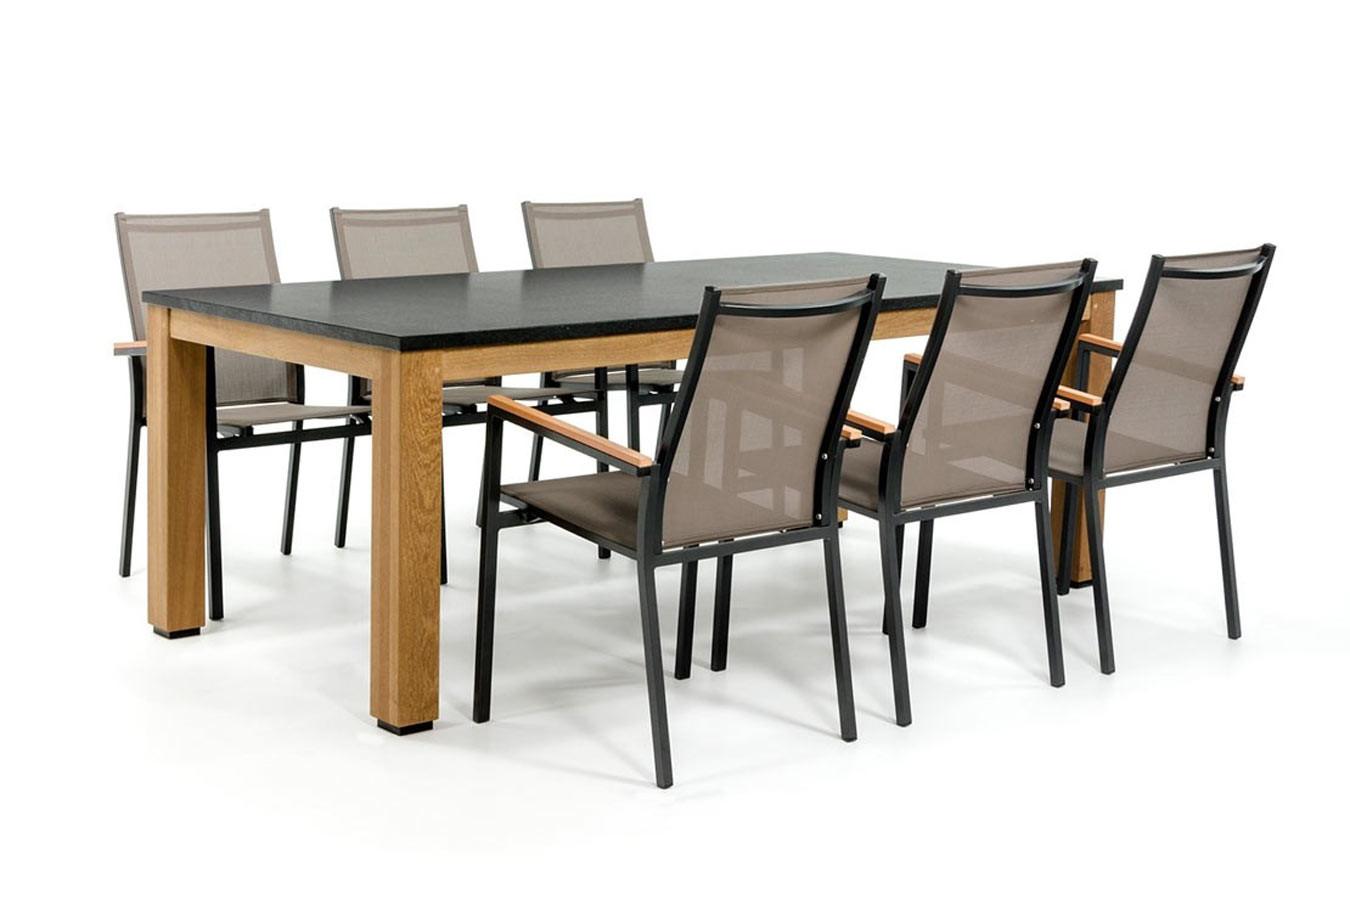 Granieten tuintafel met aluminium stoelen